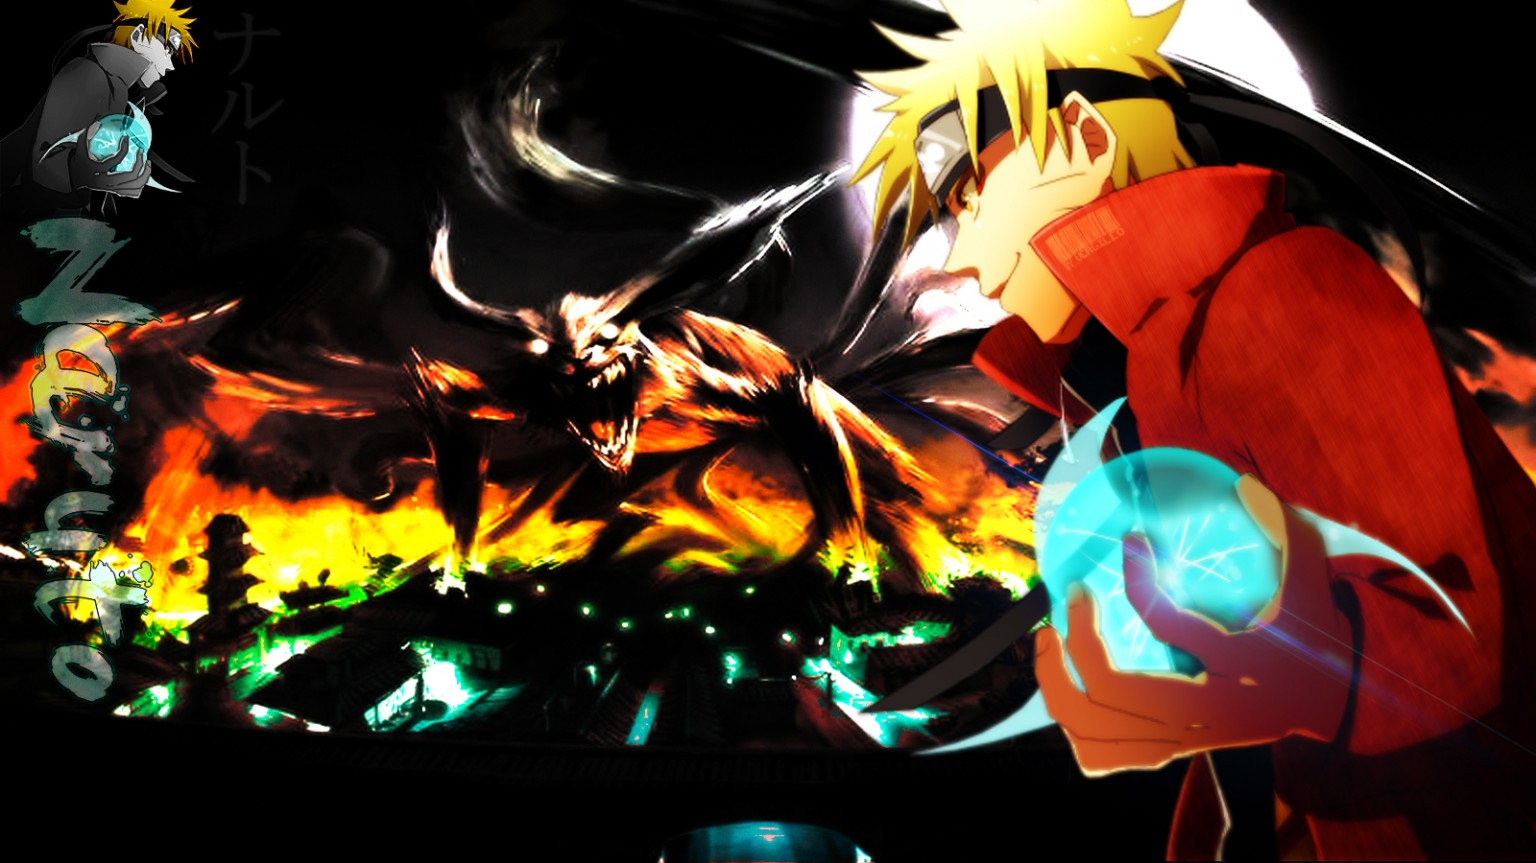 Free Download Interesting Naruto Mobile Wallpaper Live Naruto Live